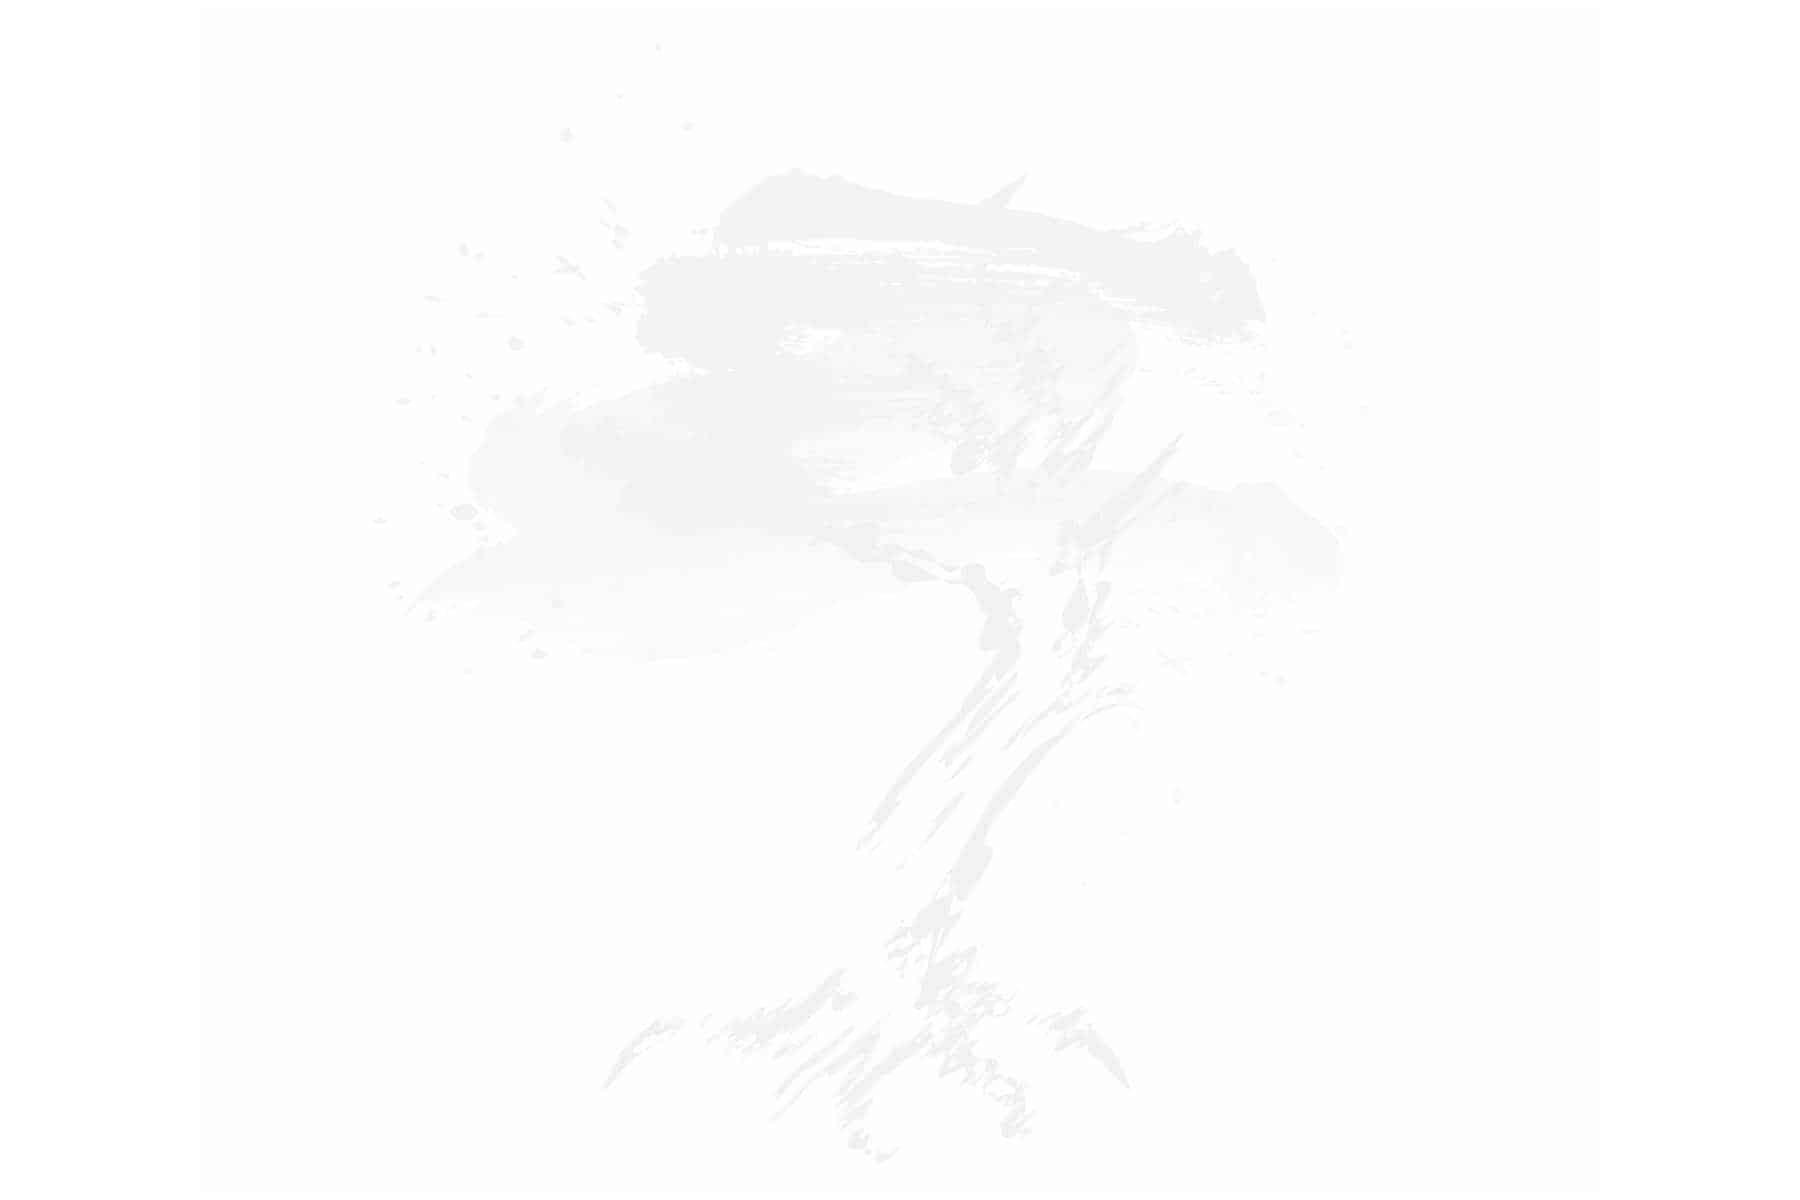 LTC Logo Transparent